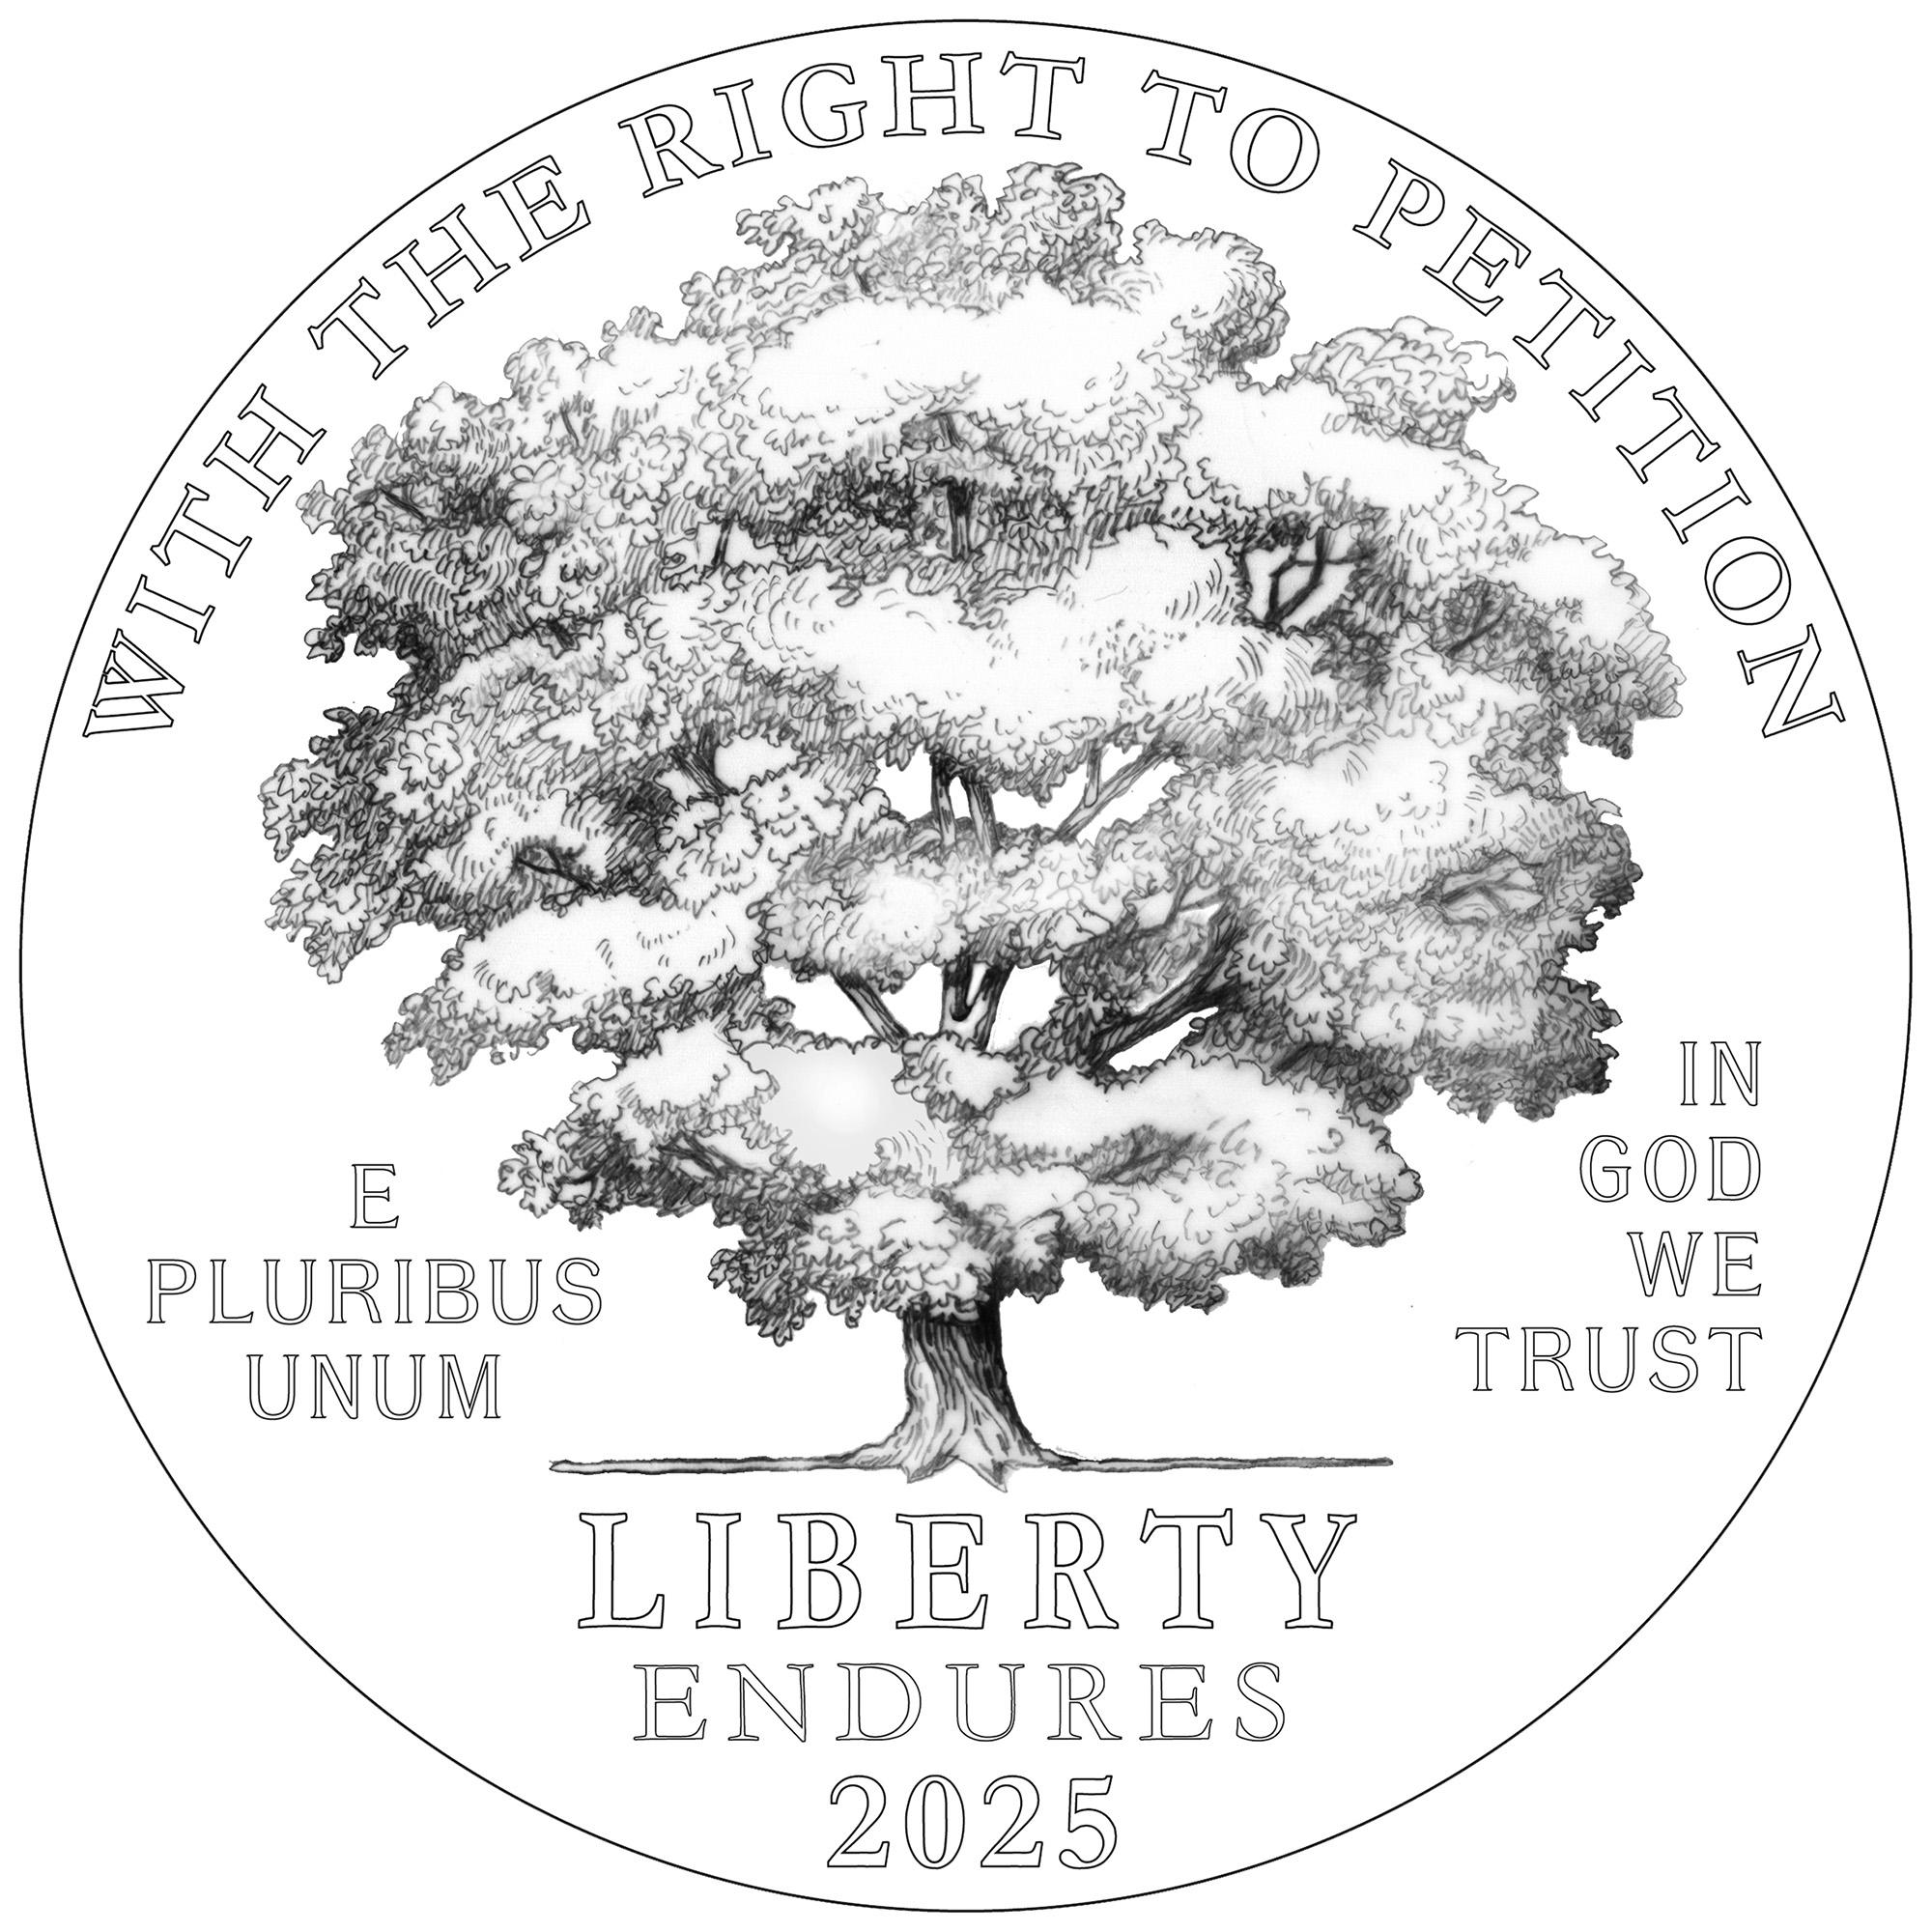 2025 American Eagle Platinum Proof Coin Line Art Obverse